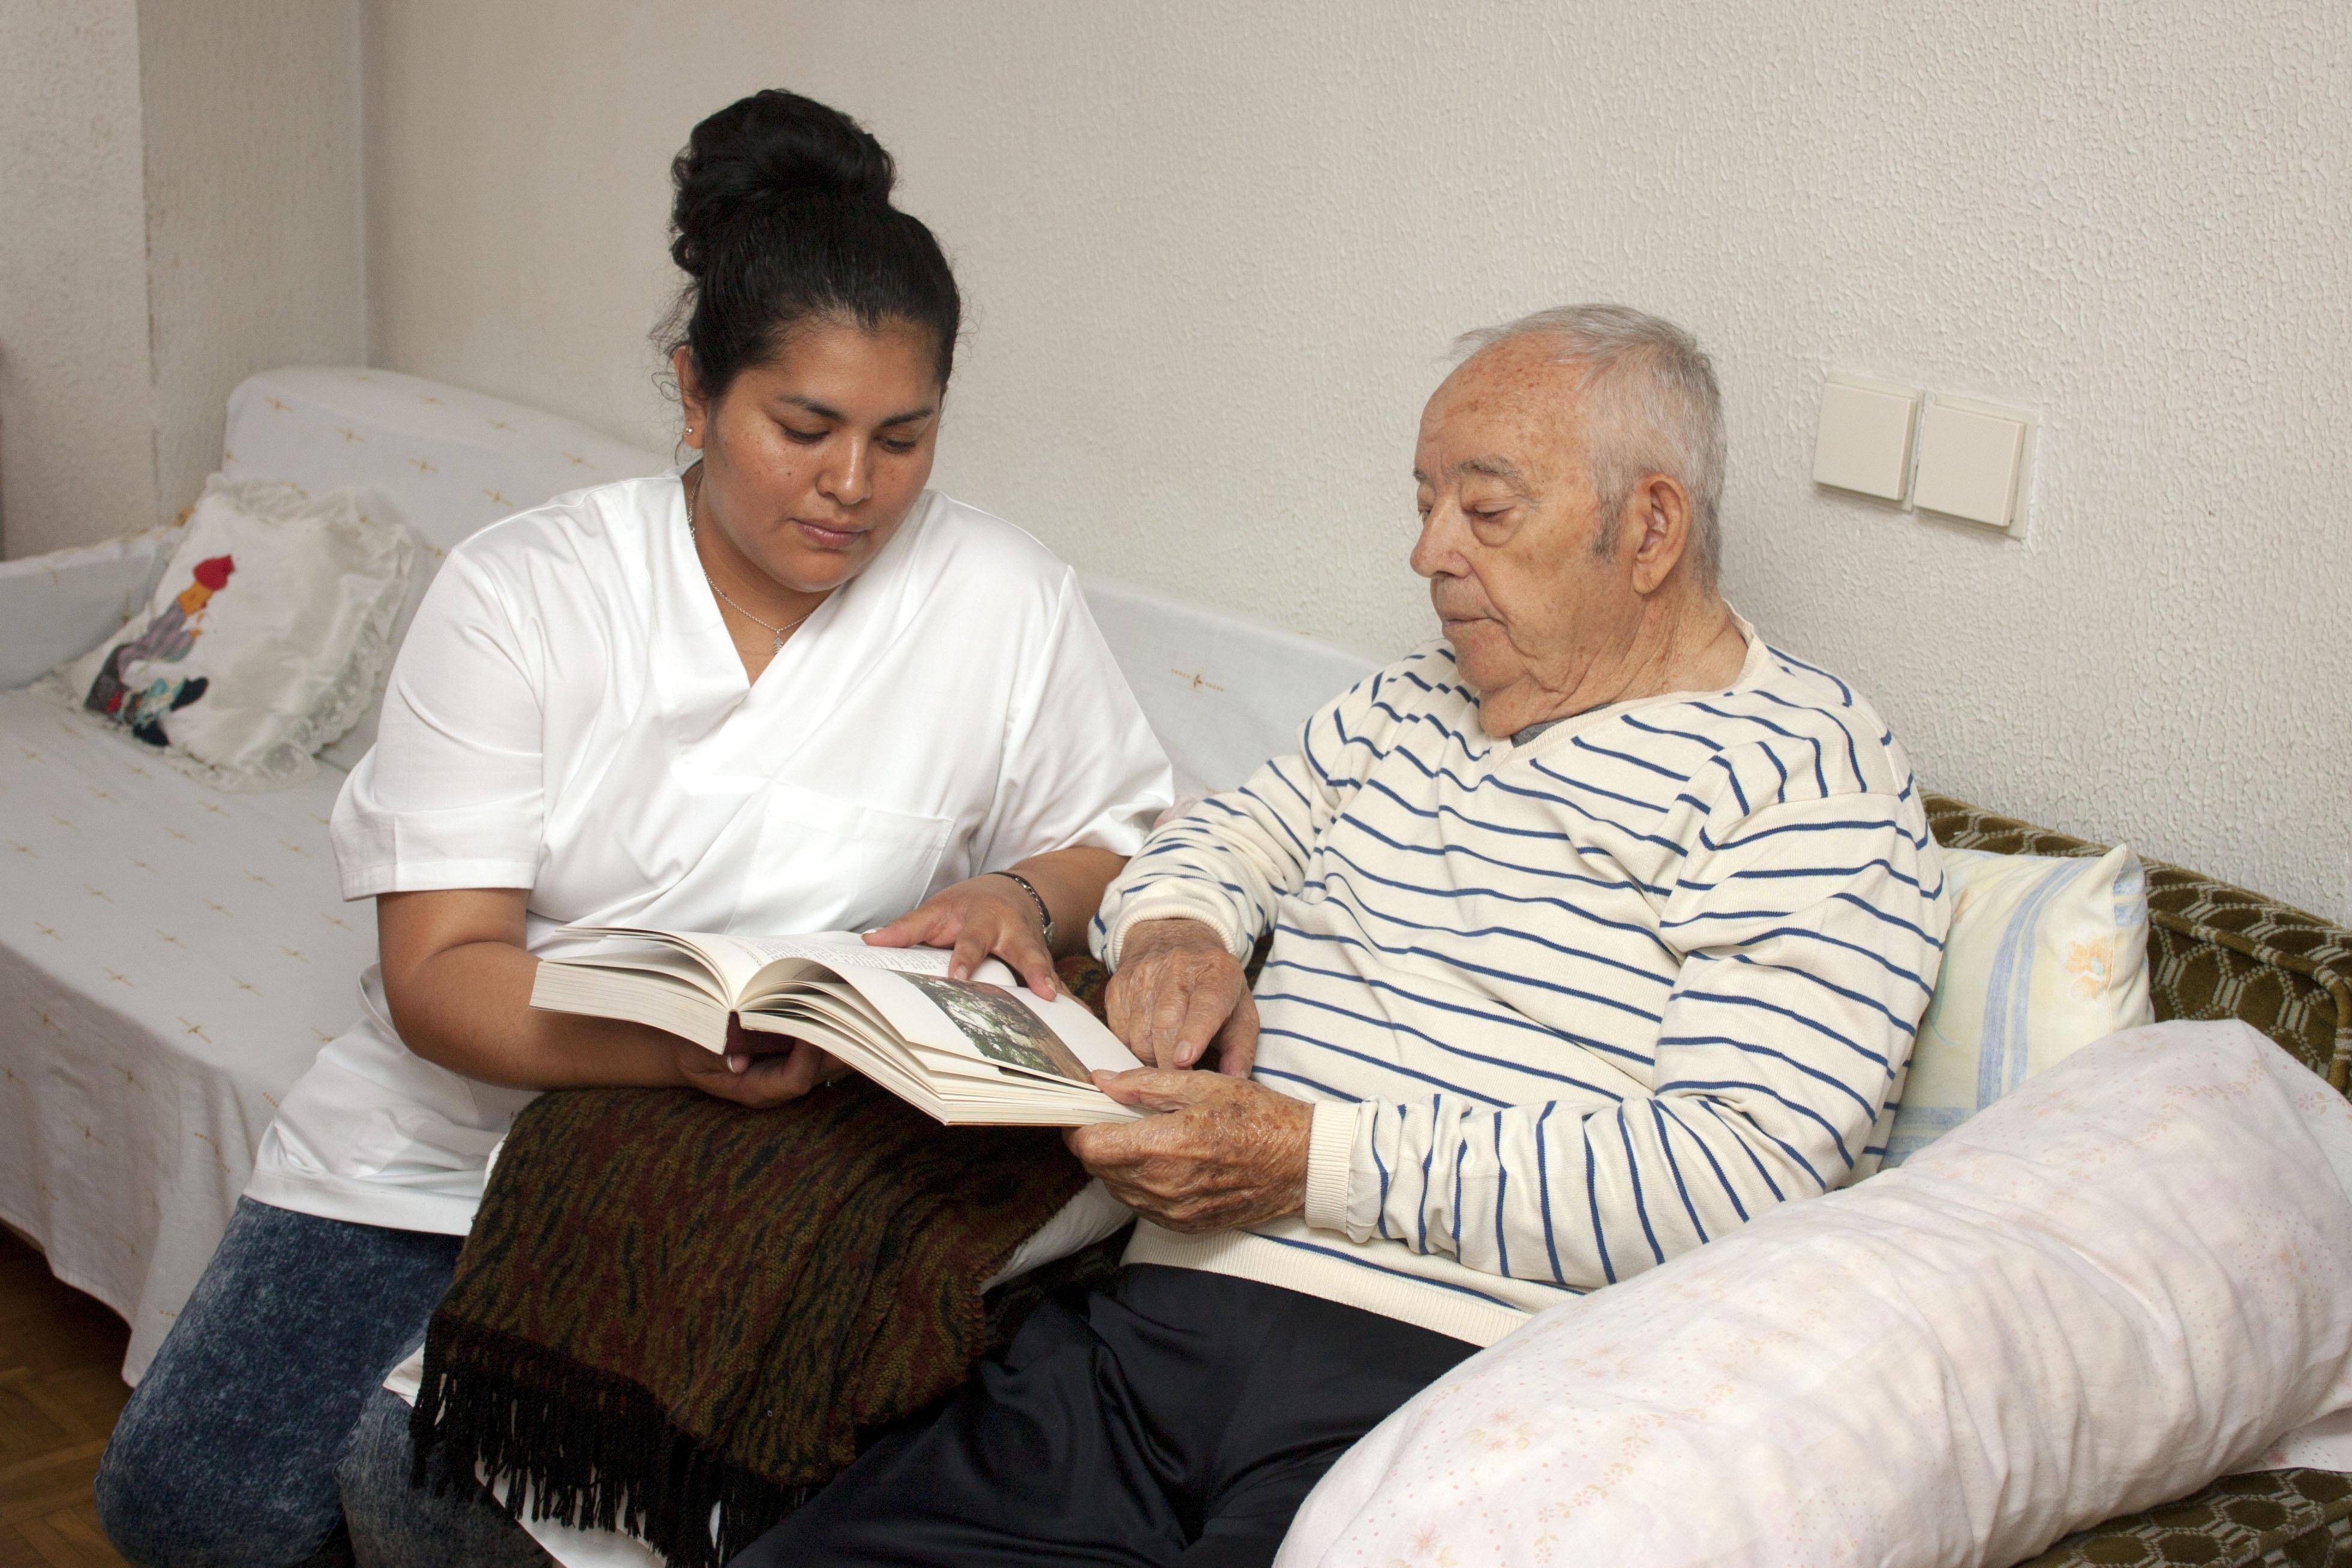 Gratis afbeeldingen man persoon bejaarde ouderling for Aide personnes agees maison retraite